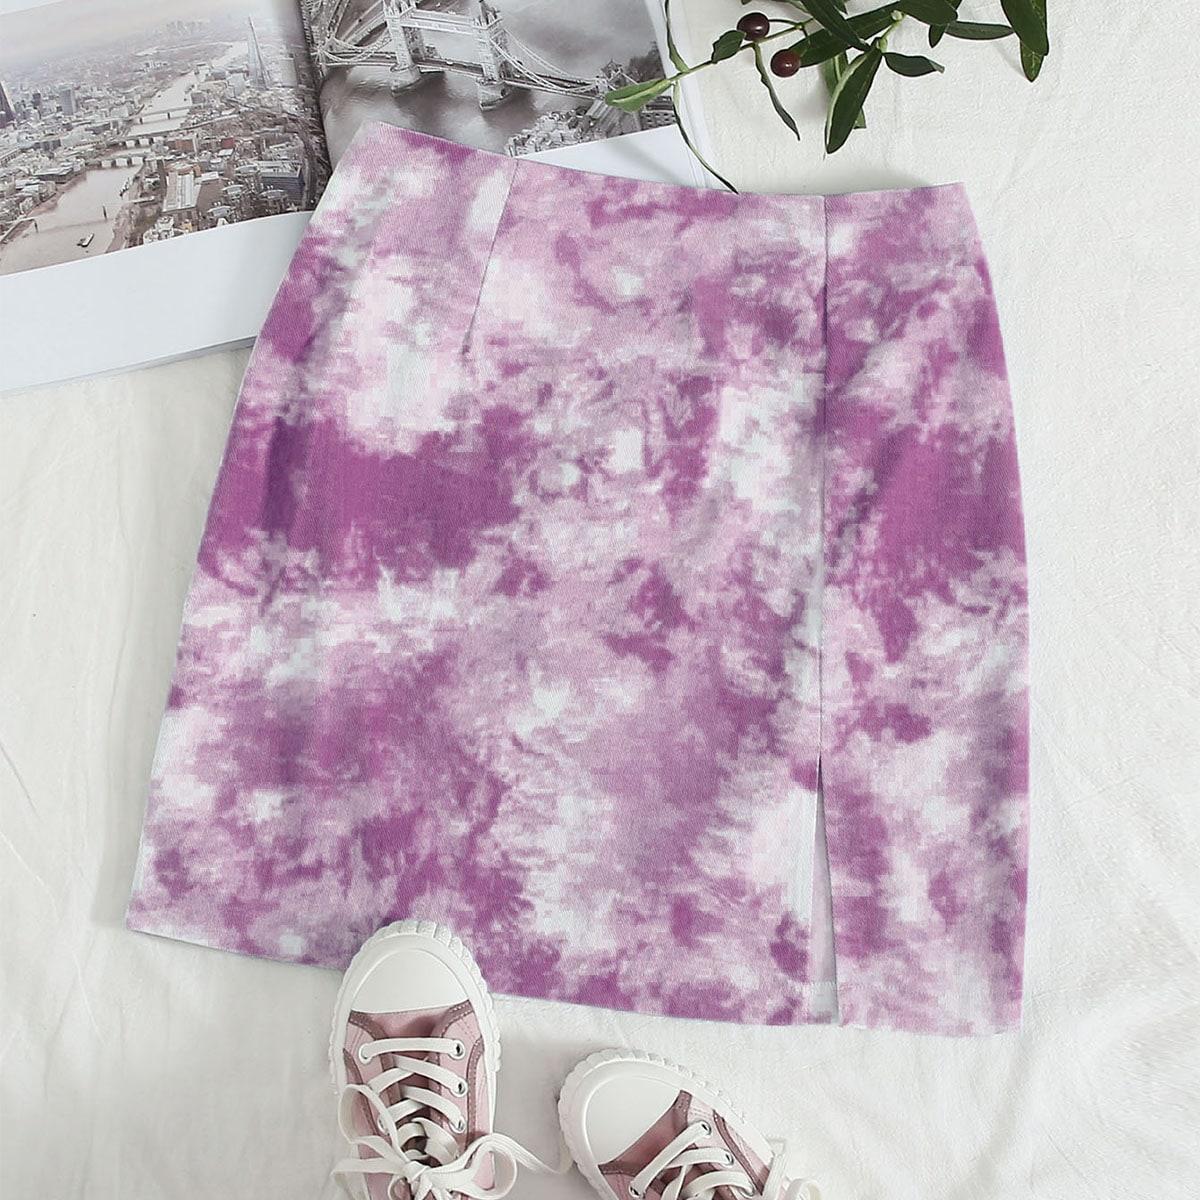 Разноцветная юбка с молнией сзади фото